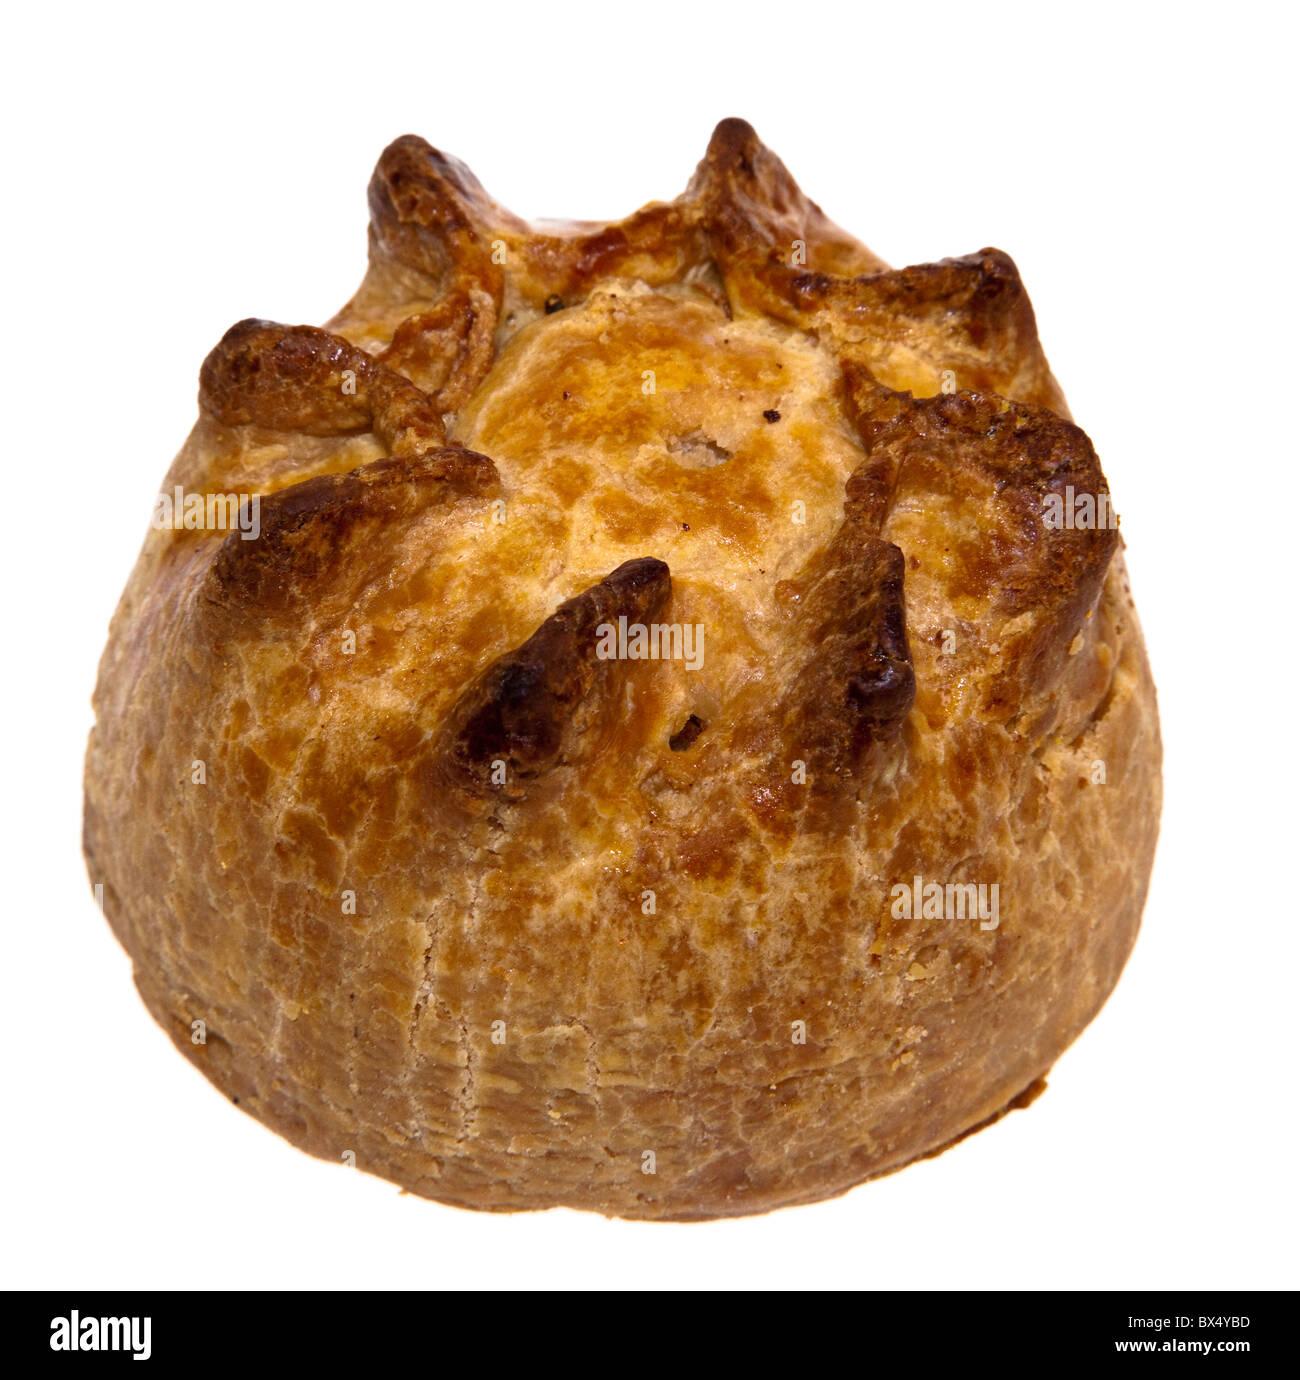 Pork pie sold by artisan butcher UK - Stock Image